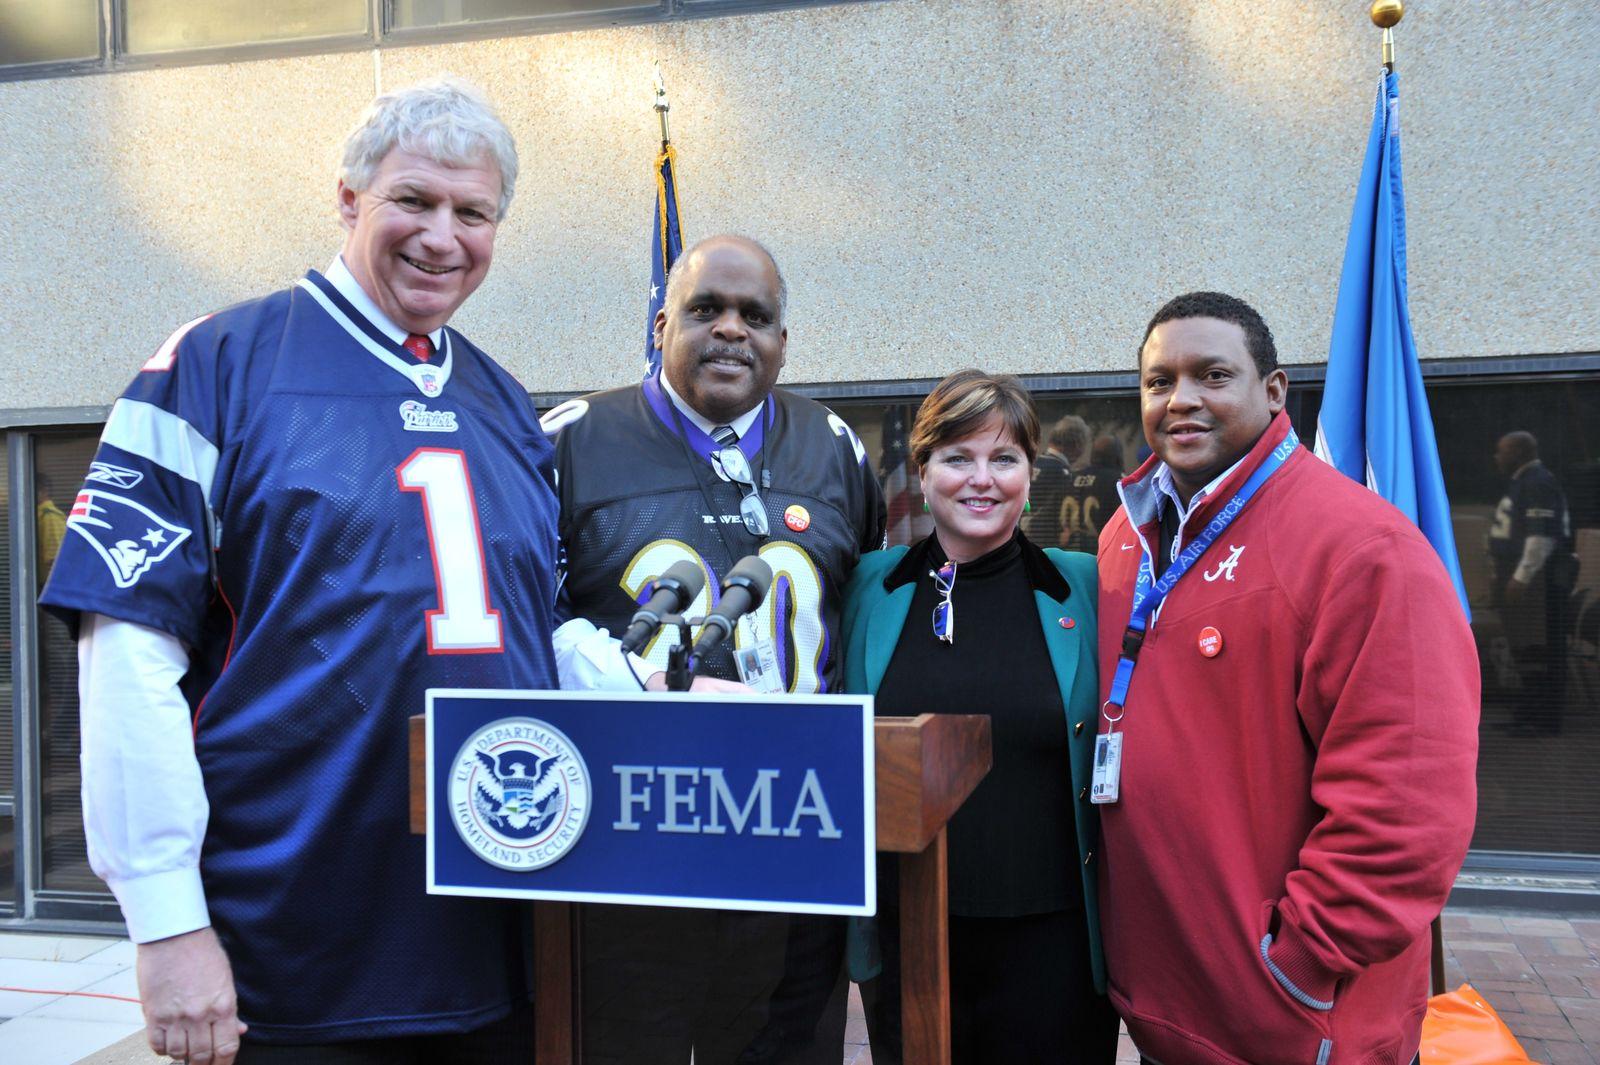 Washington, D. C. , November 9, 2010 -- From left to right: FEMA Deputy Administrator Richard Serino; Steward Beckham, CFC-NCA Campaign Executive; Leigh Trocine, CFCNCA Executive and Christopher Jones gather together at the conclusion of the CFC kick-off event. FEMA/Aaron Skolnik